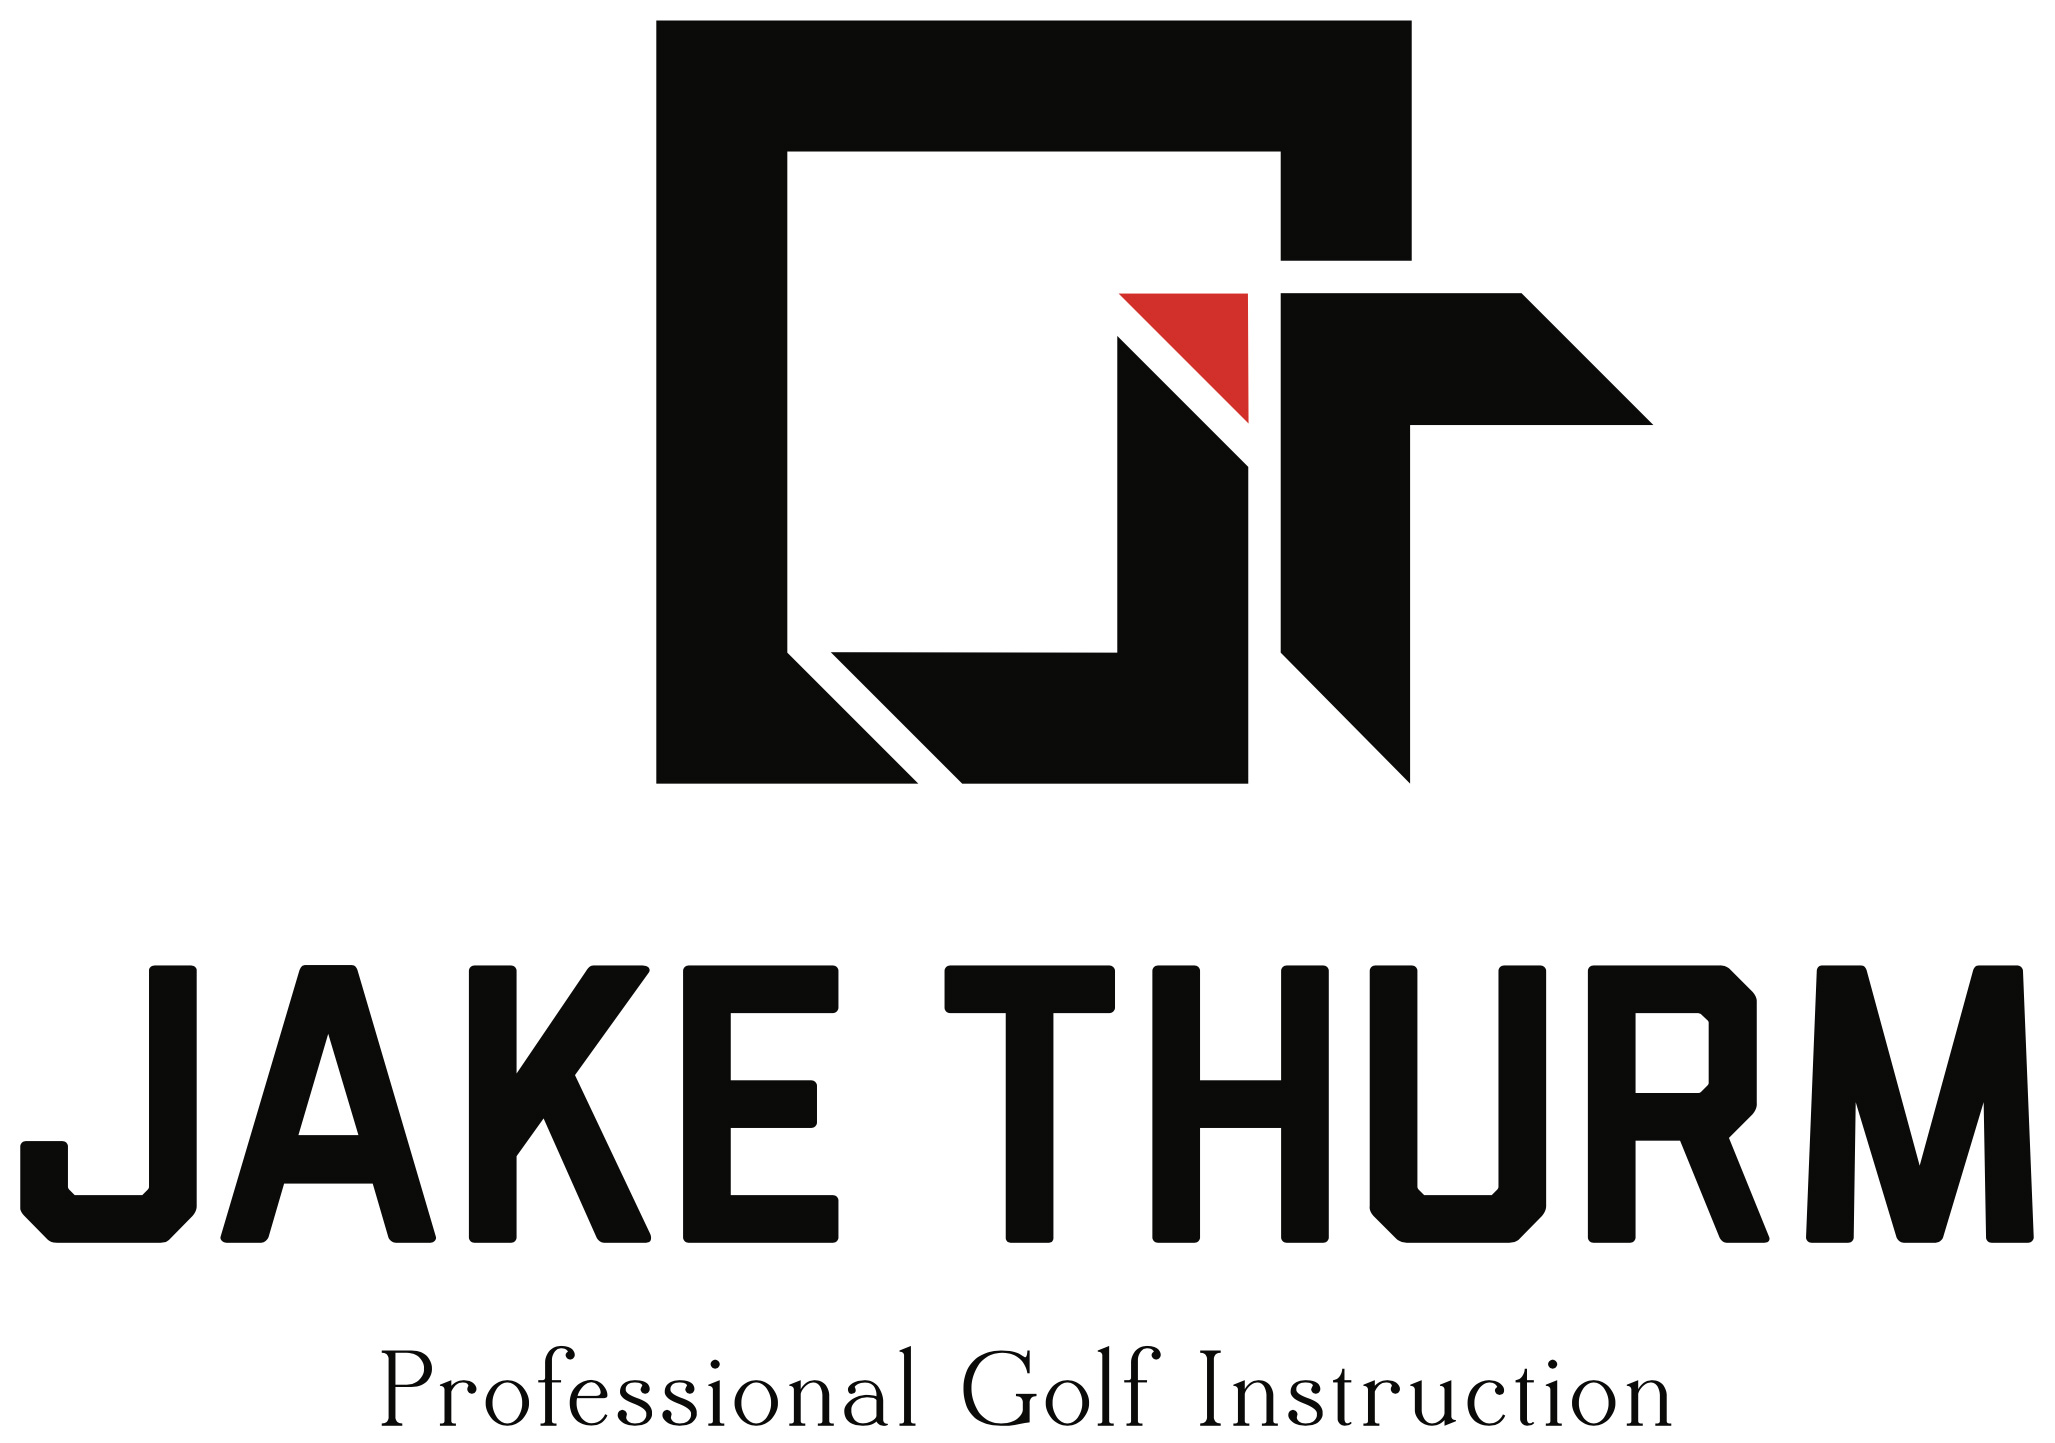 carbon-creative-providence-rhode-island-jake-thurm-pga-golf-instructor-chicago.jpg